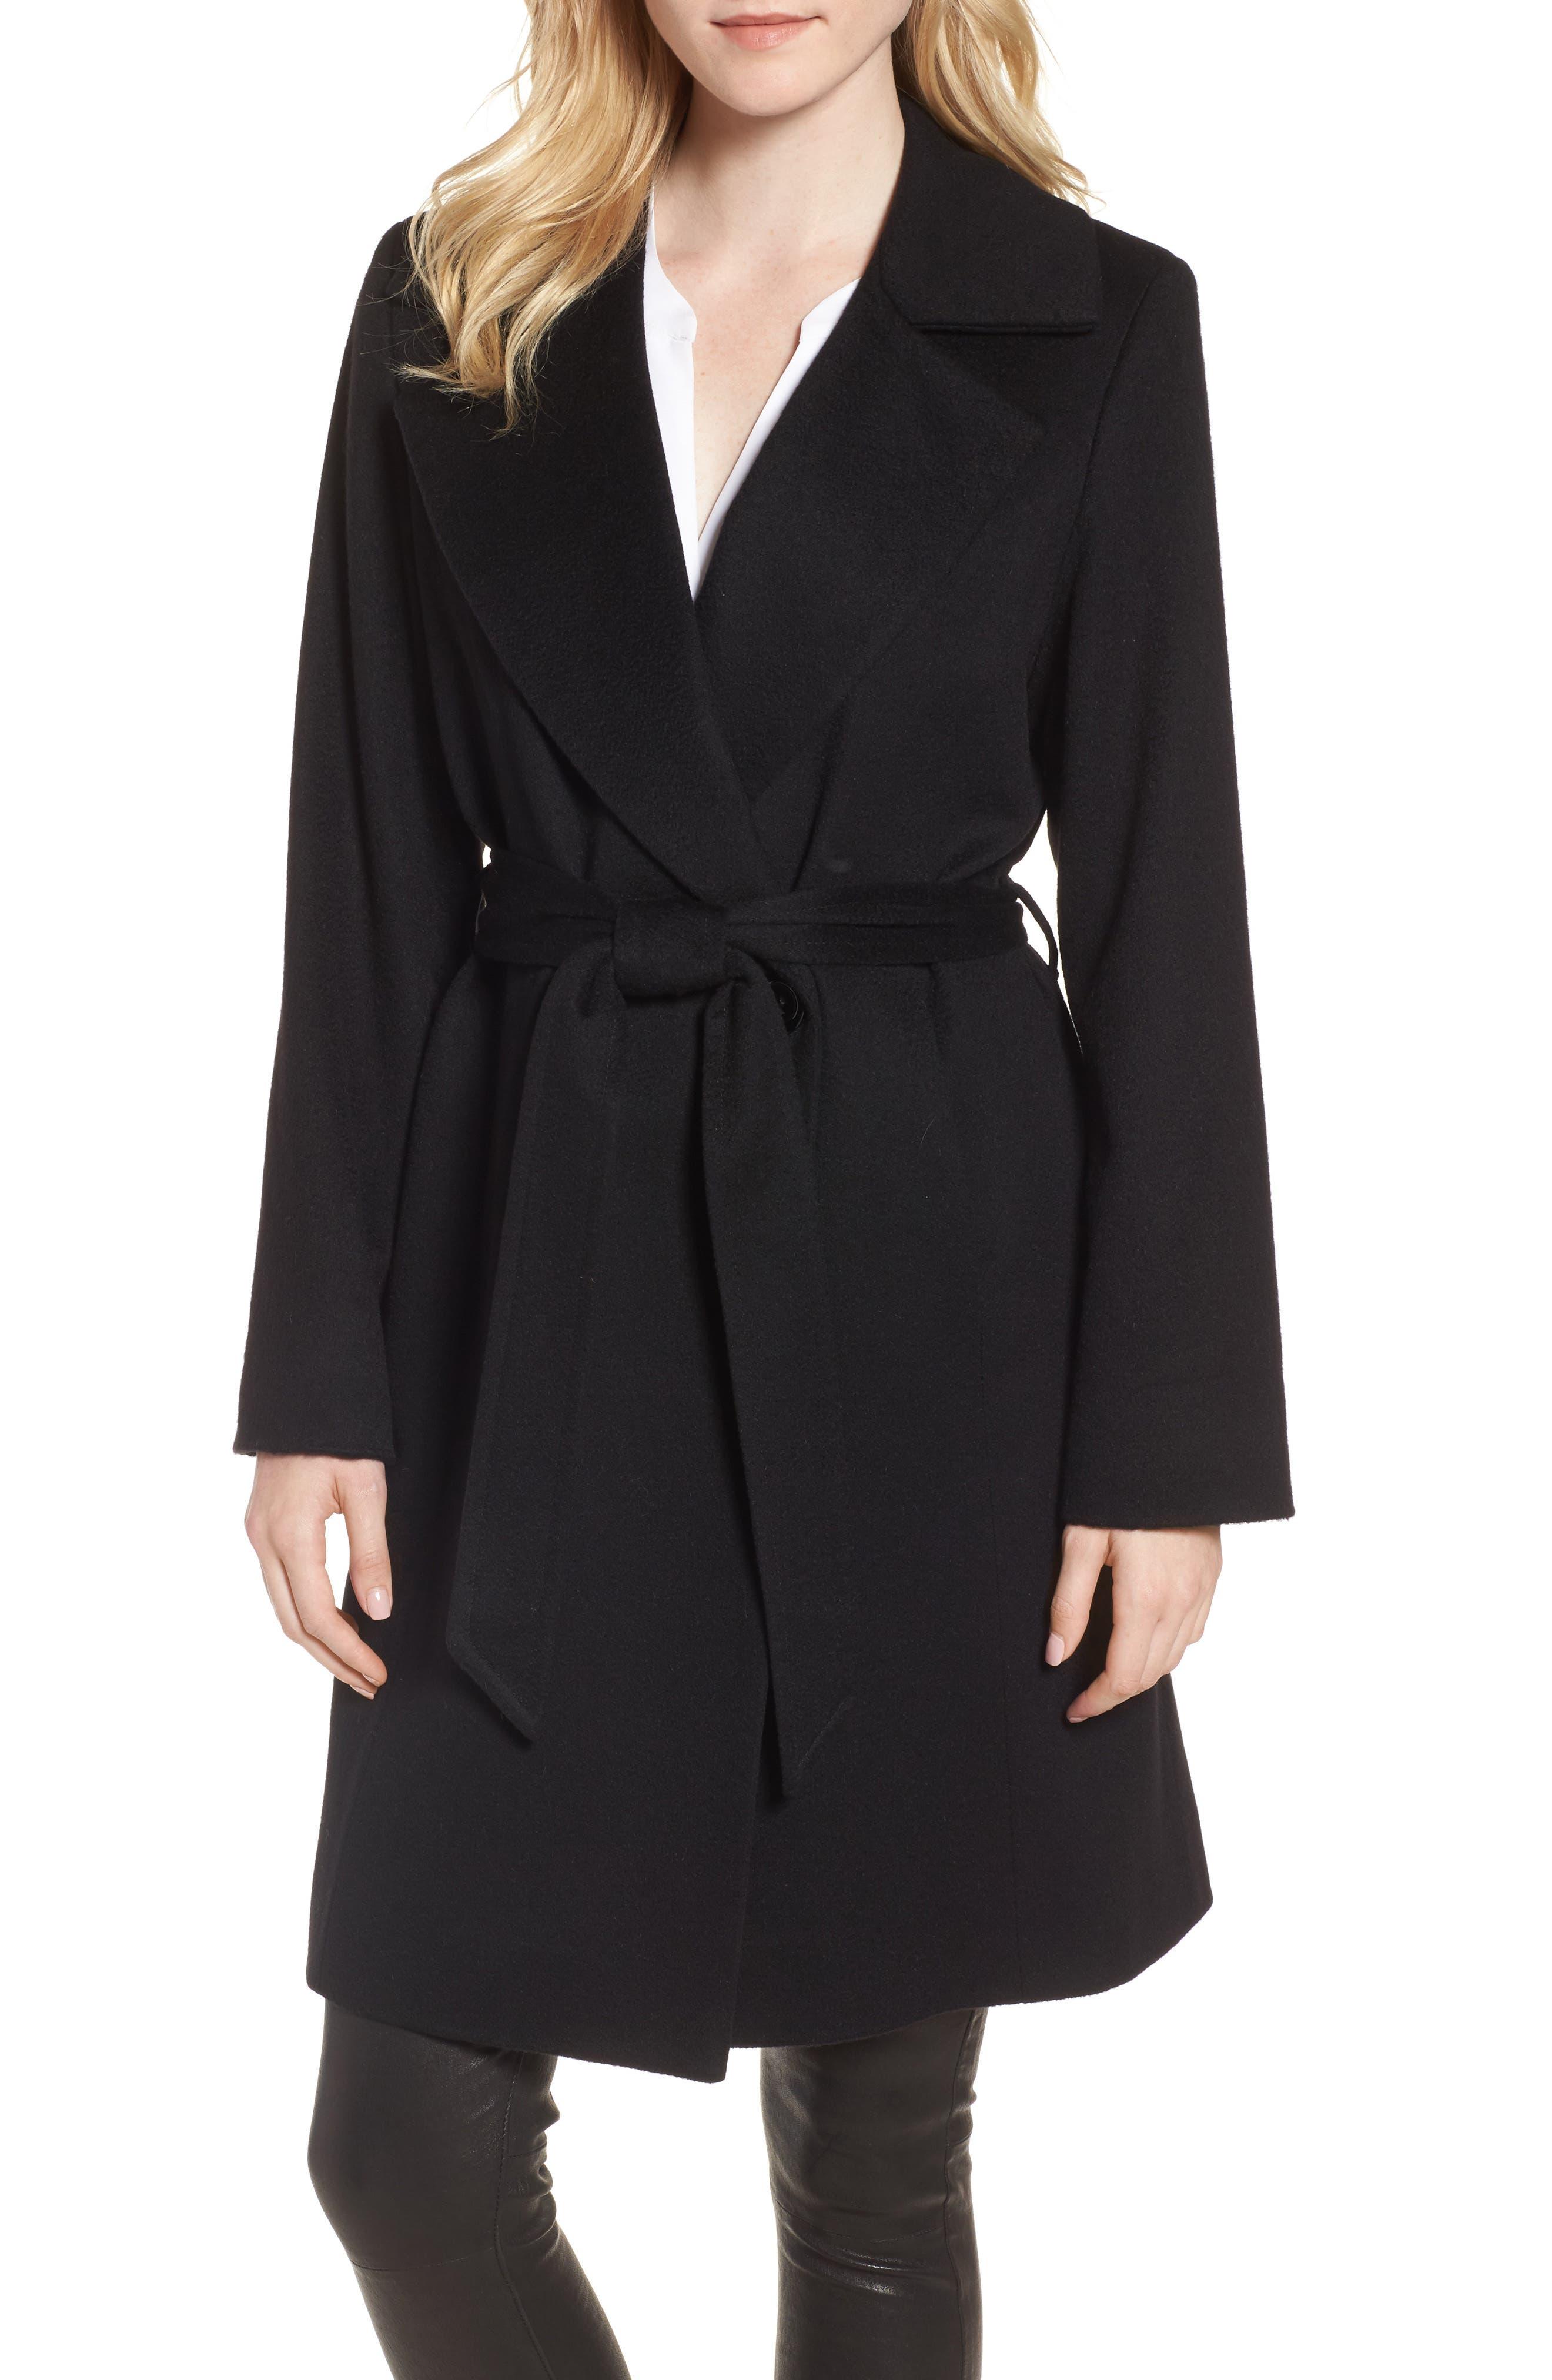 Sofia Cashmere Notch Collar Cashmere Wrap Coat